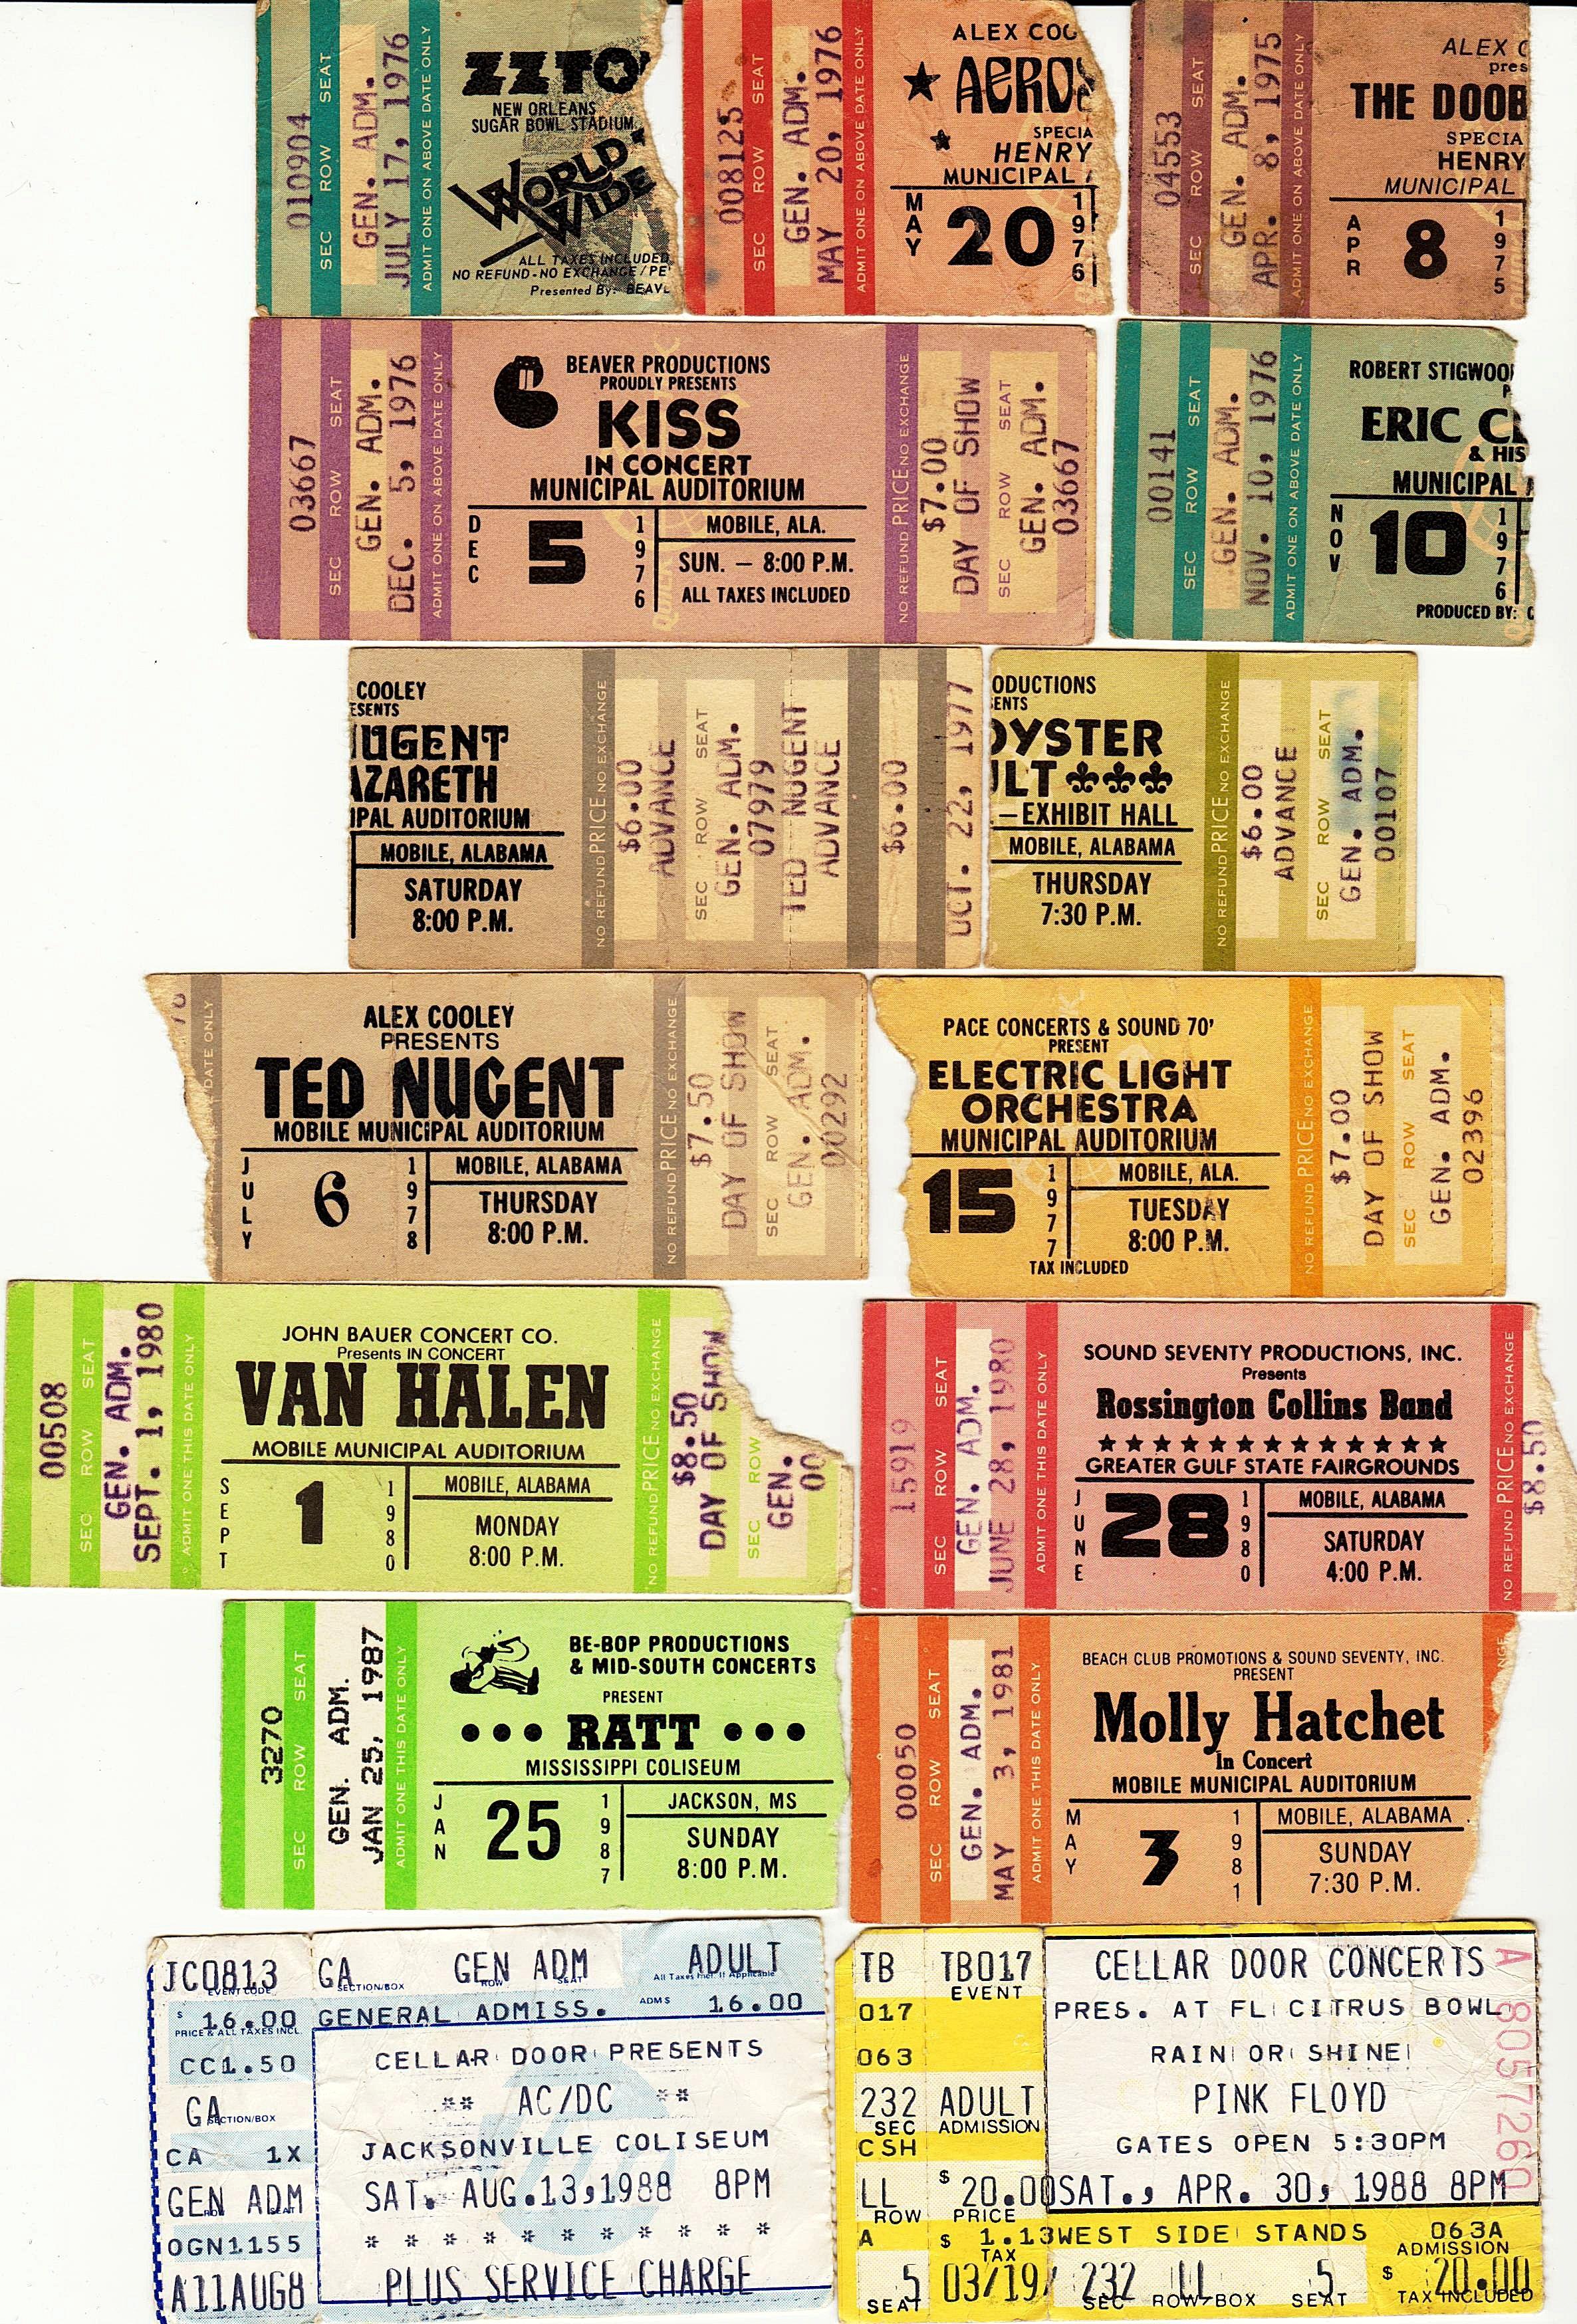 1970s Pink Floyd Concert Ticket Stub Google Search